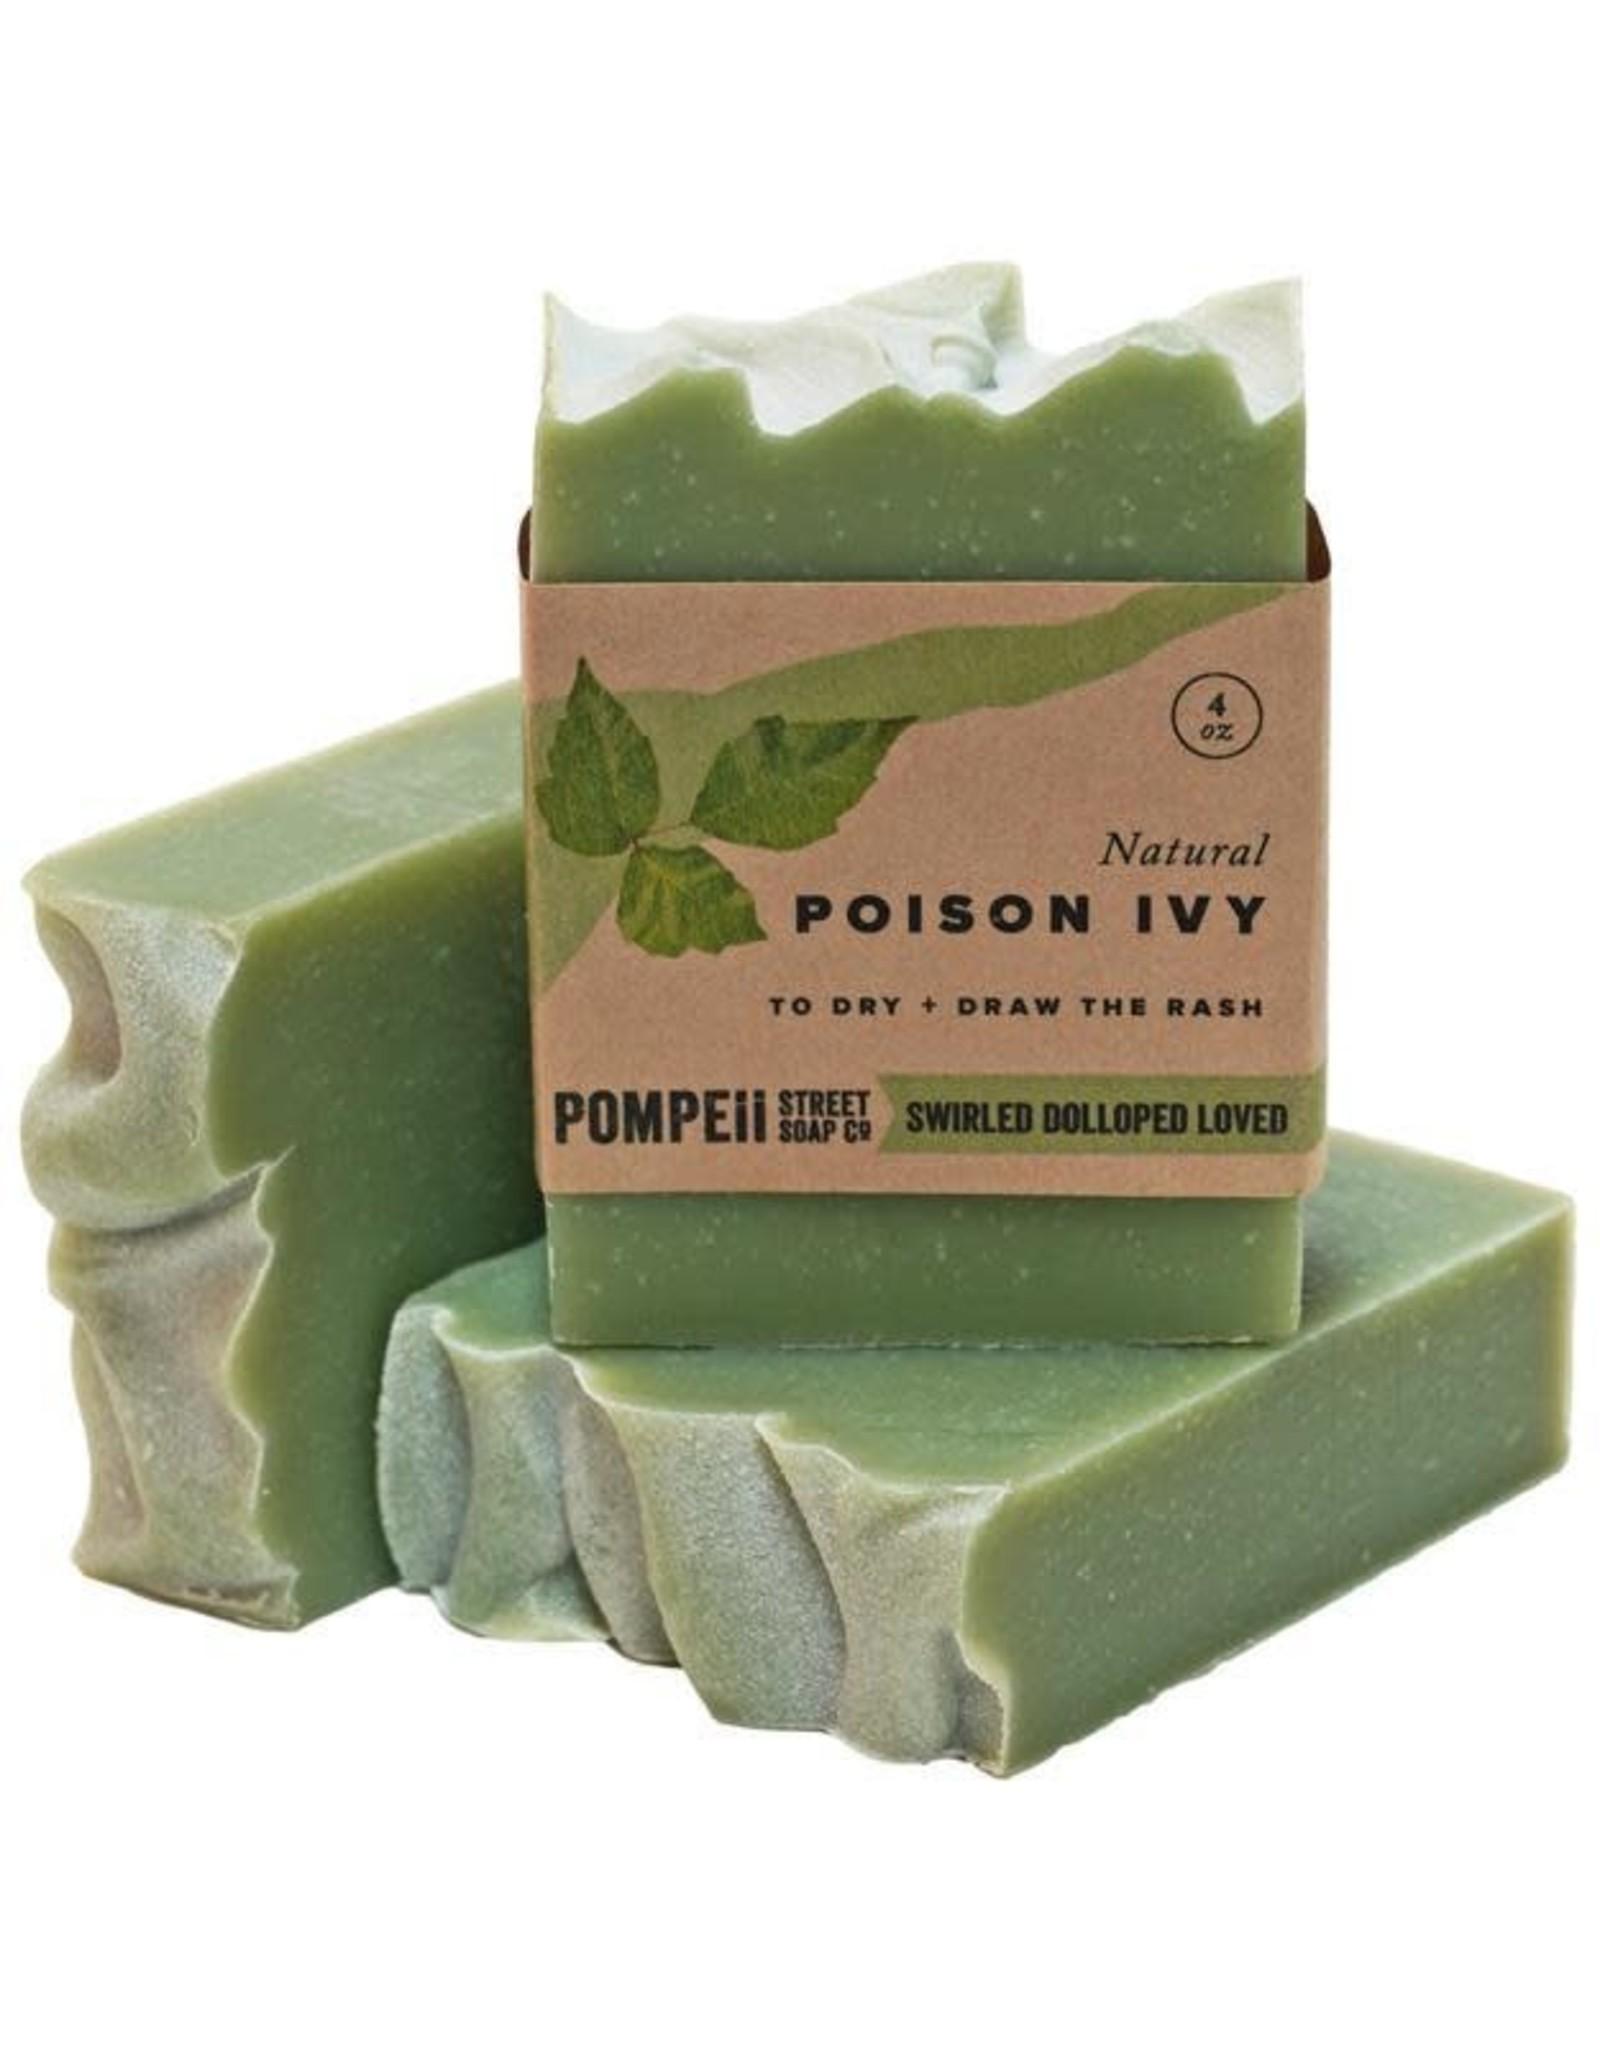 Pompeii Poison Ivy Soap Bar 4 oz.